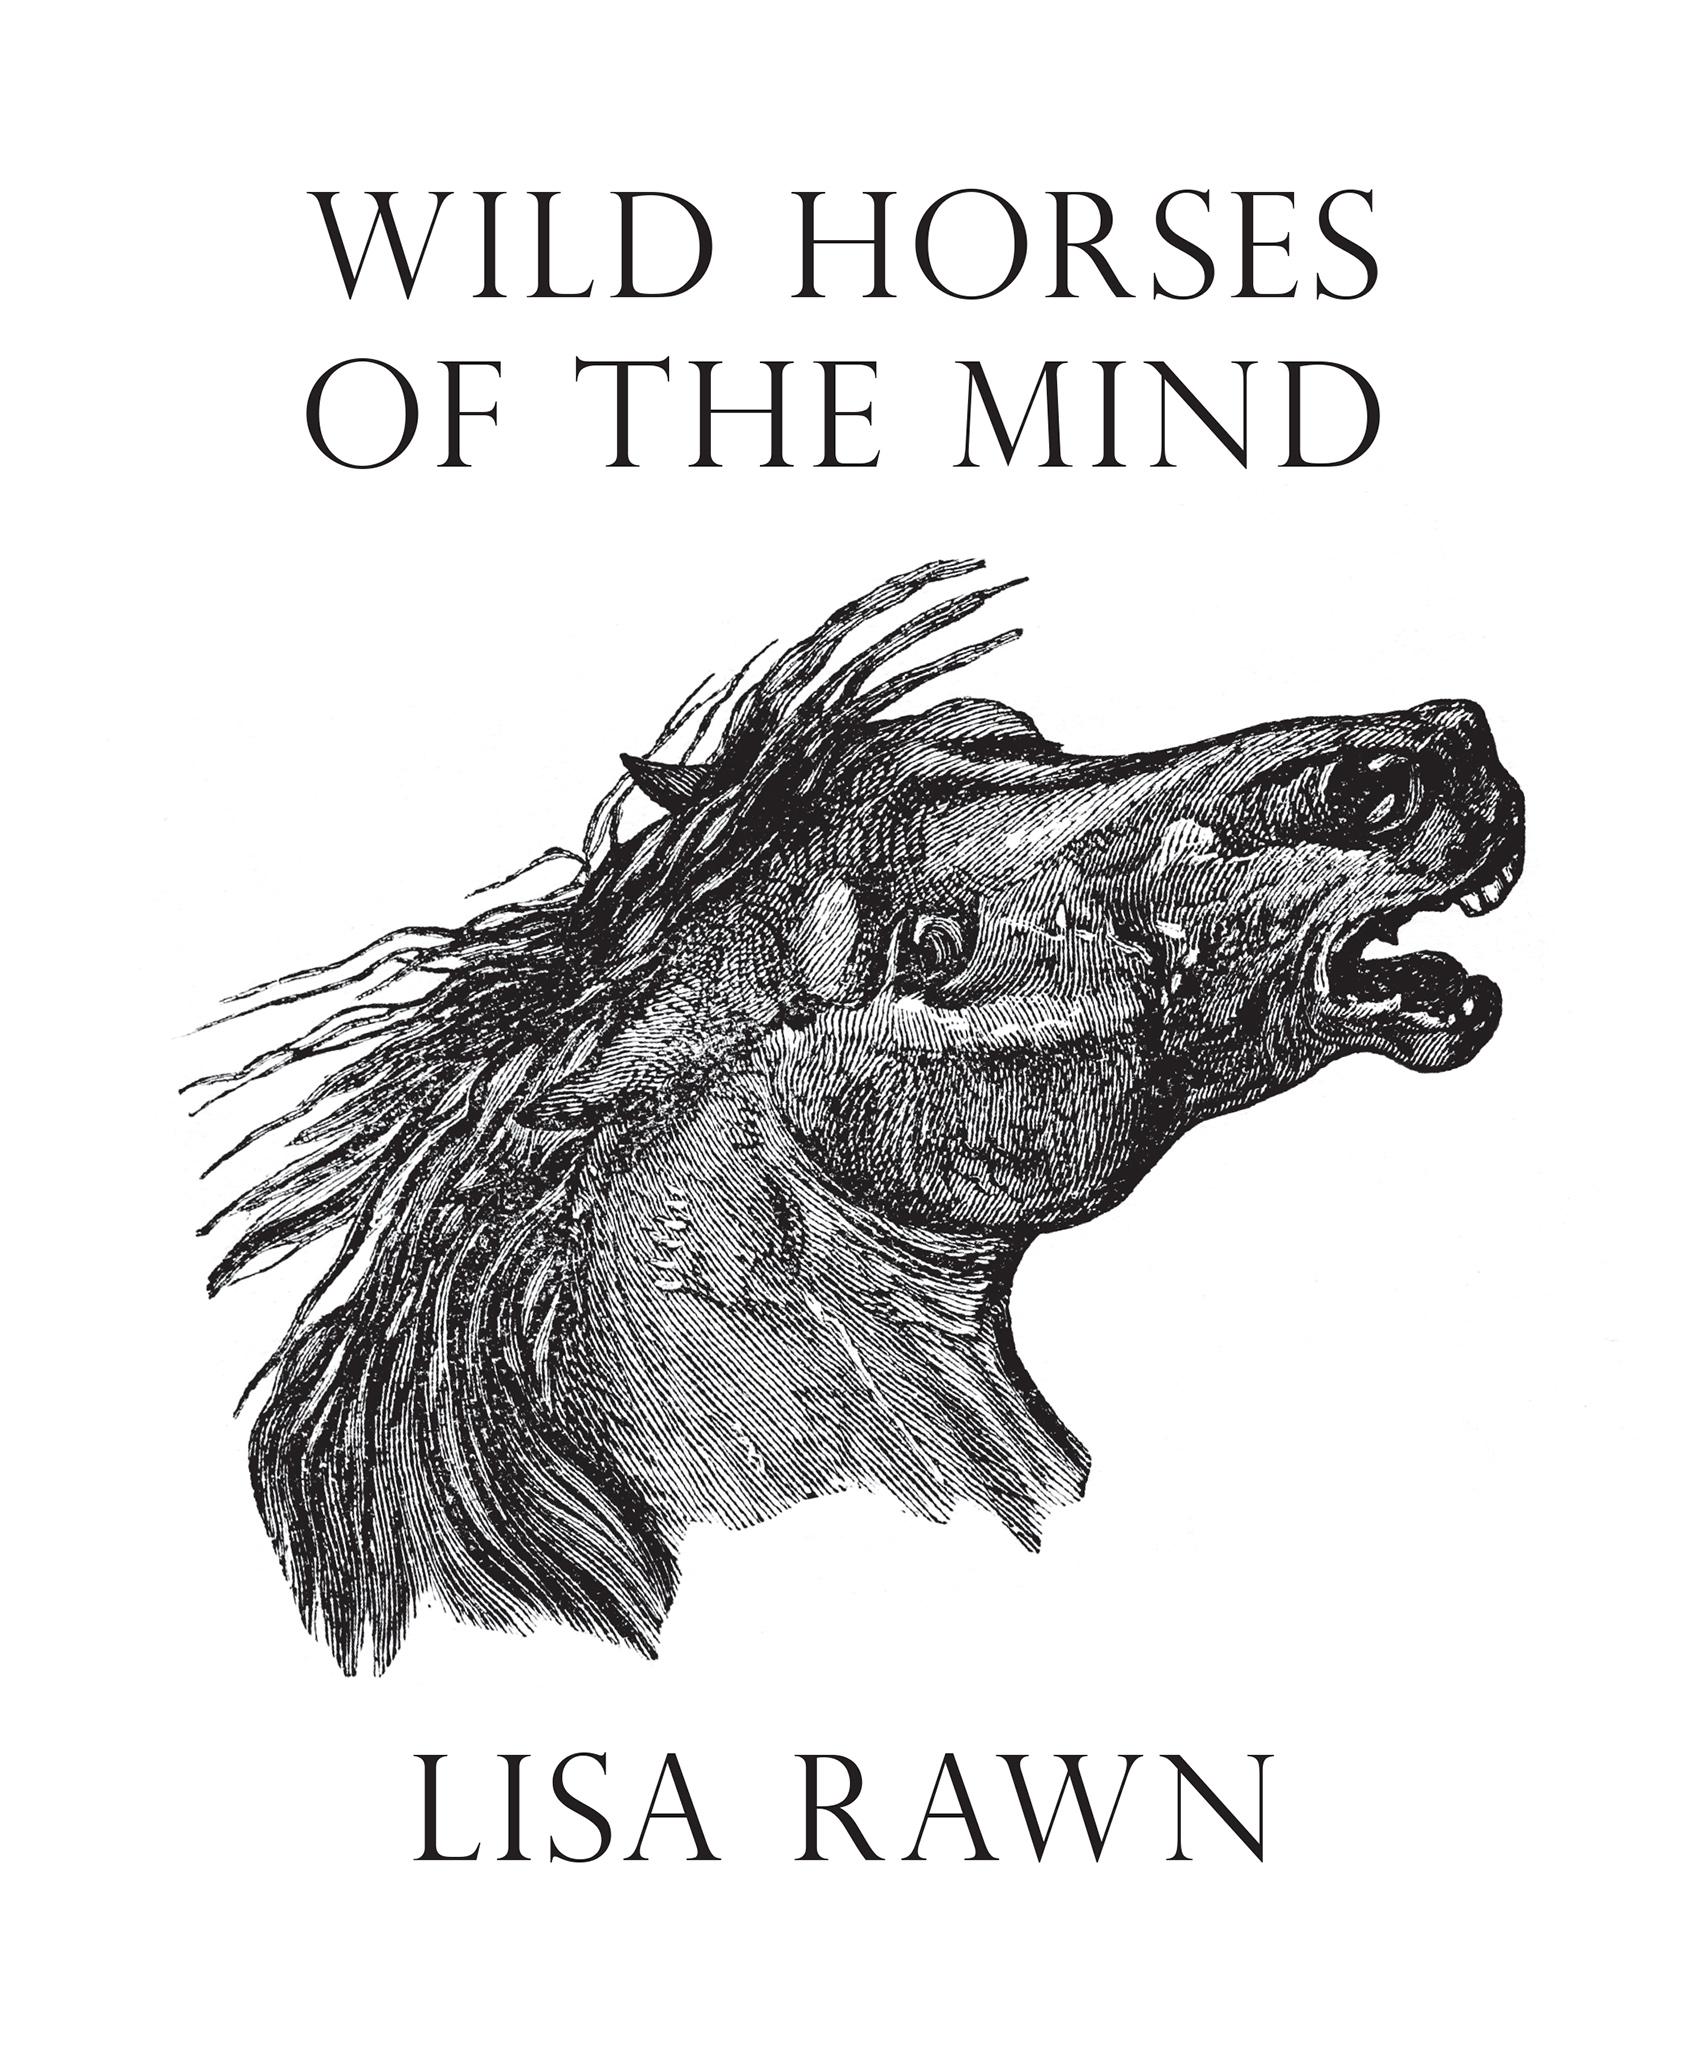 Wild Horses of the Mind